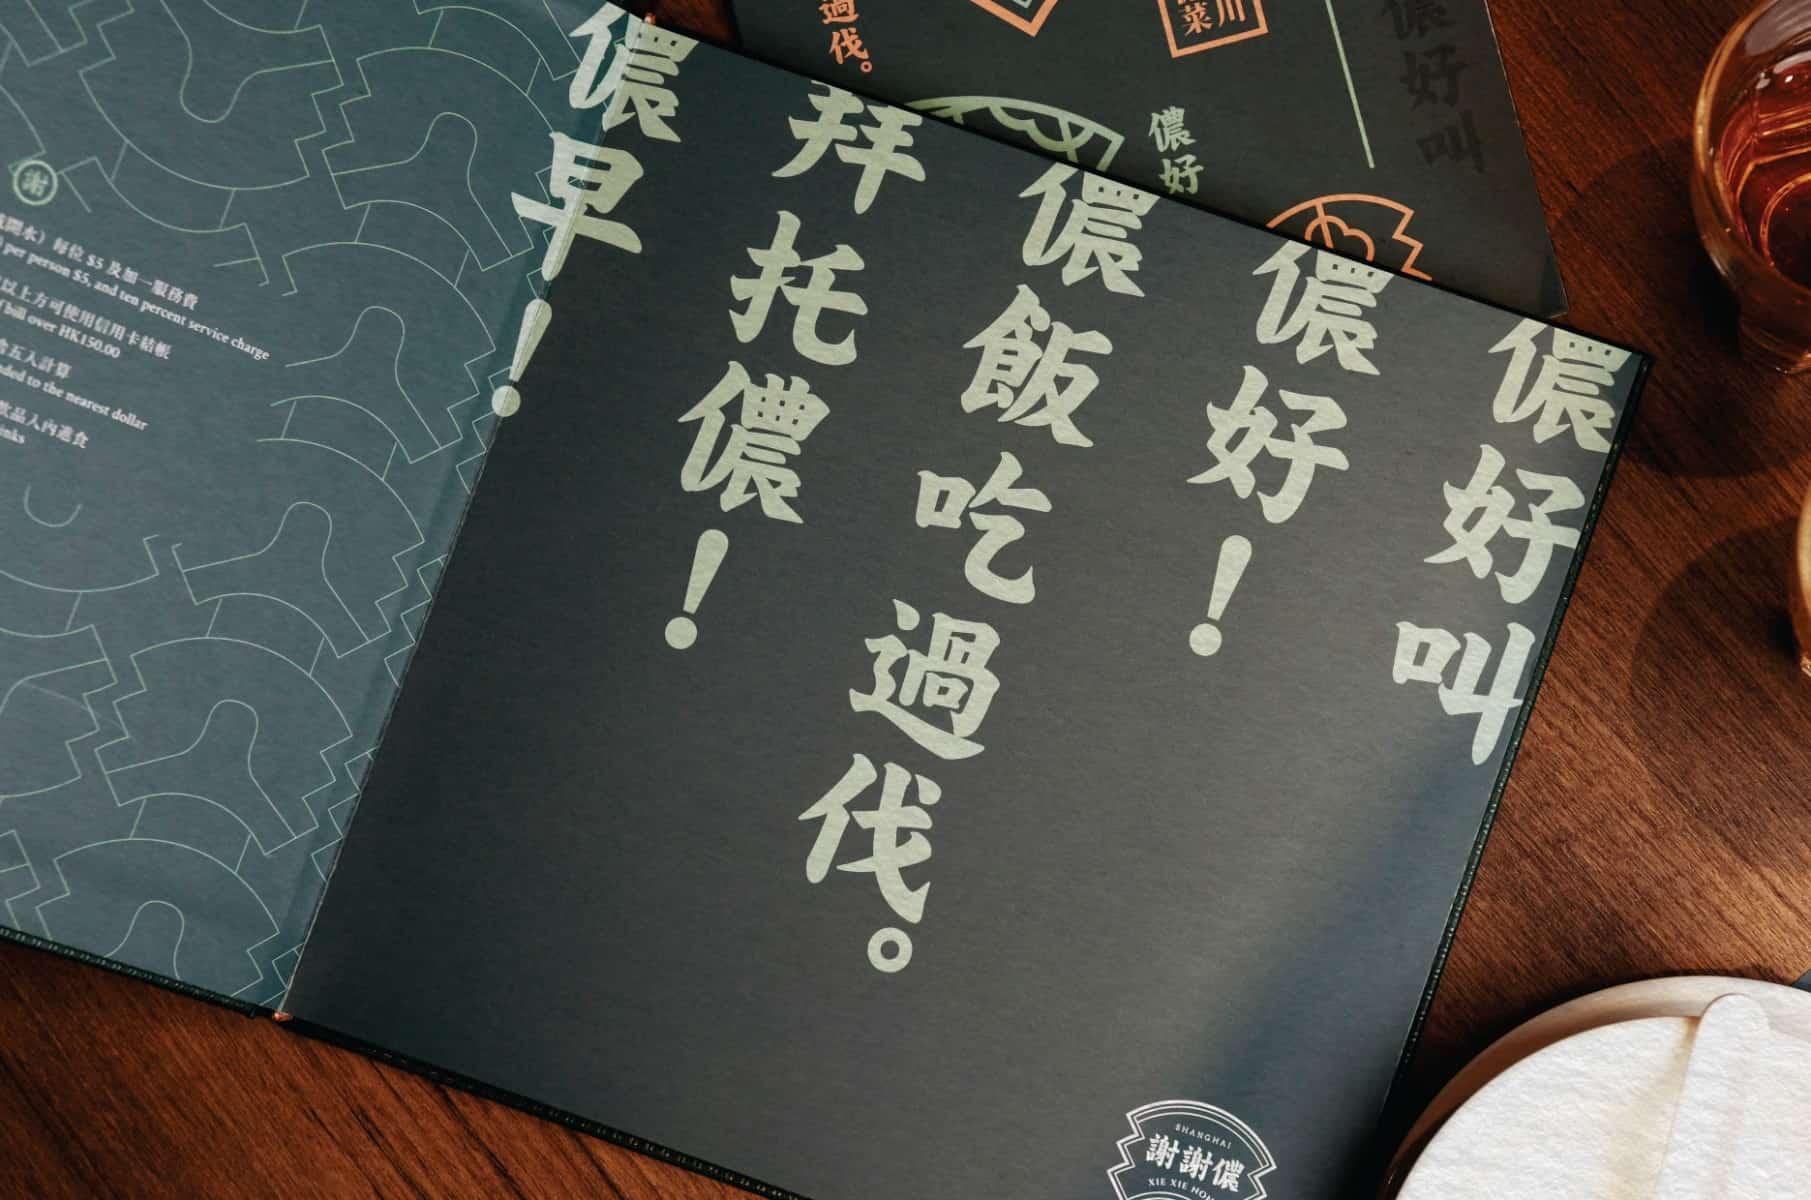 Xie Xie Nong 謝謝儂   京川滬菜   Branding design